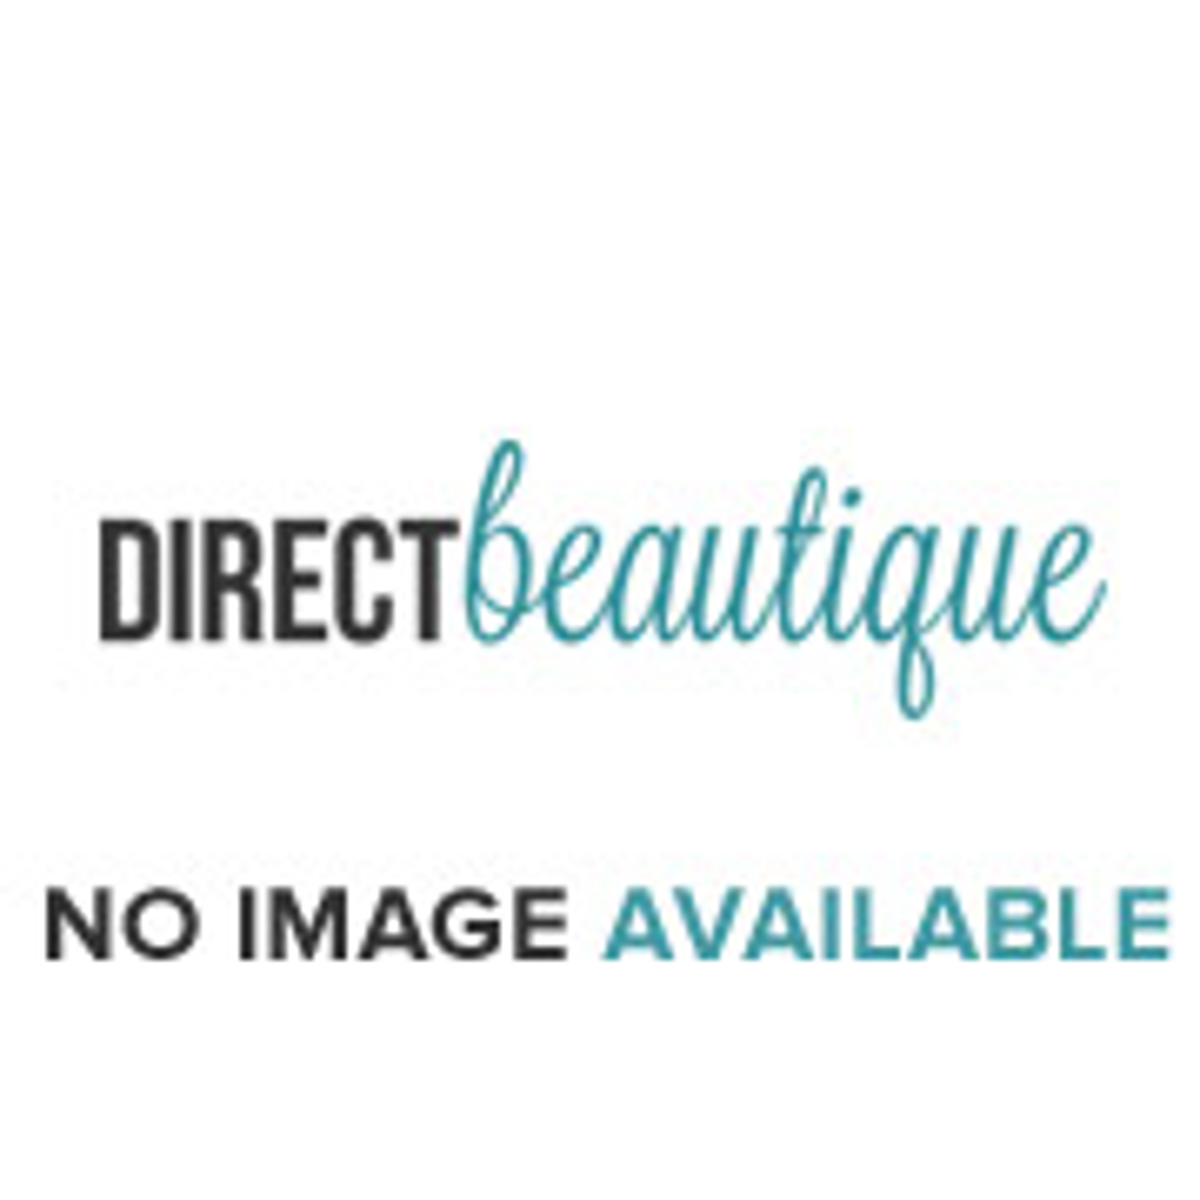 Clarins Multi-Active Antioxidant Day Cream 50ml